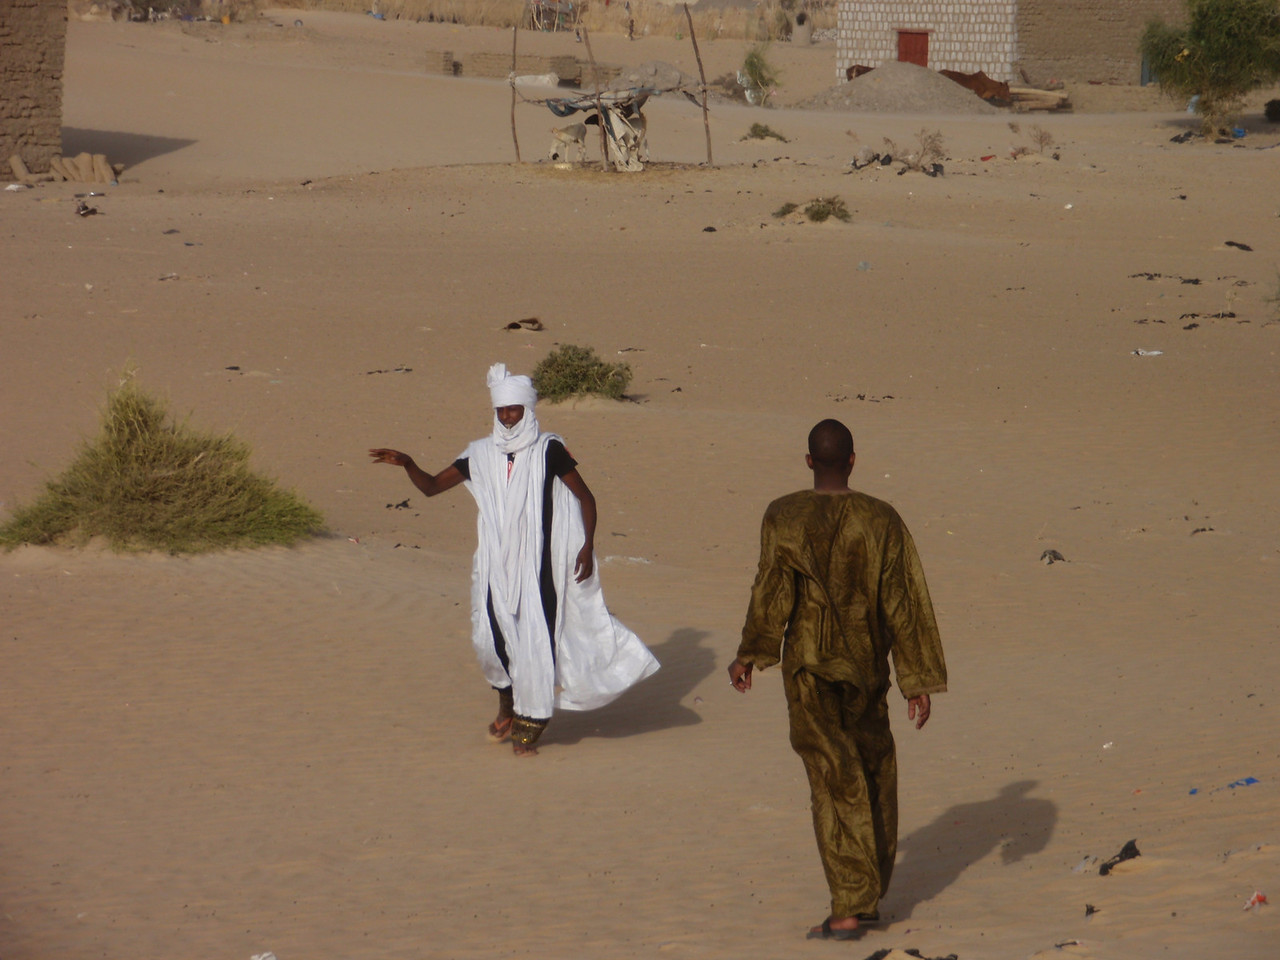 041_Timbuktu  Tuareg  Nomadic Pastoralists and Traders